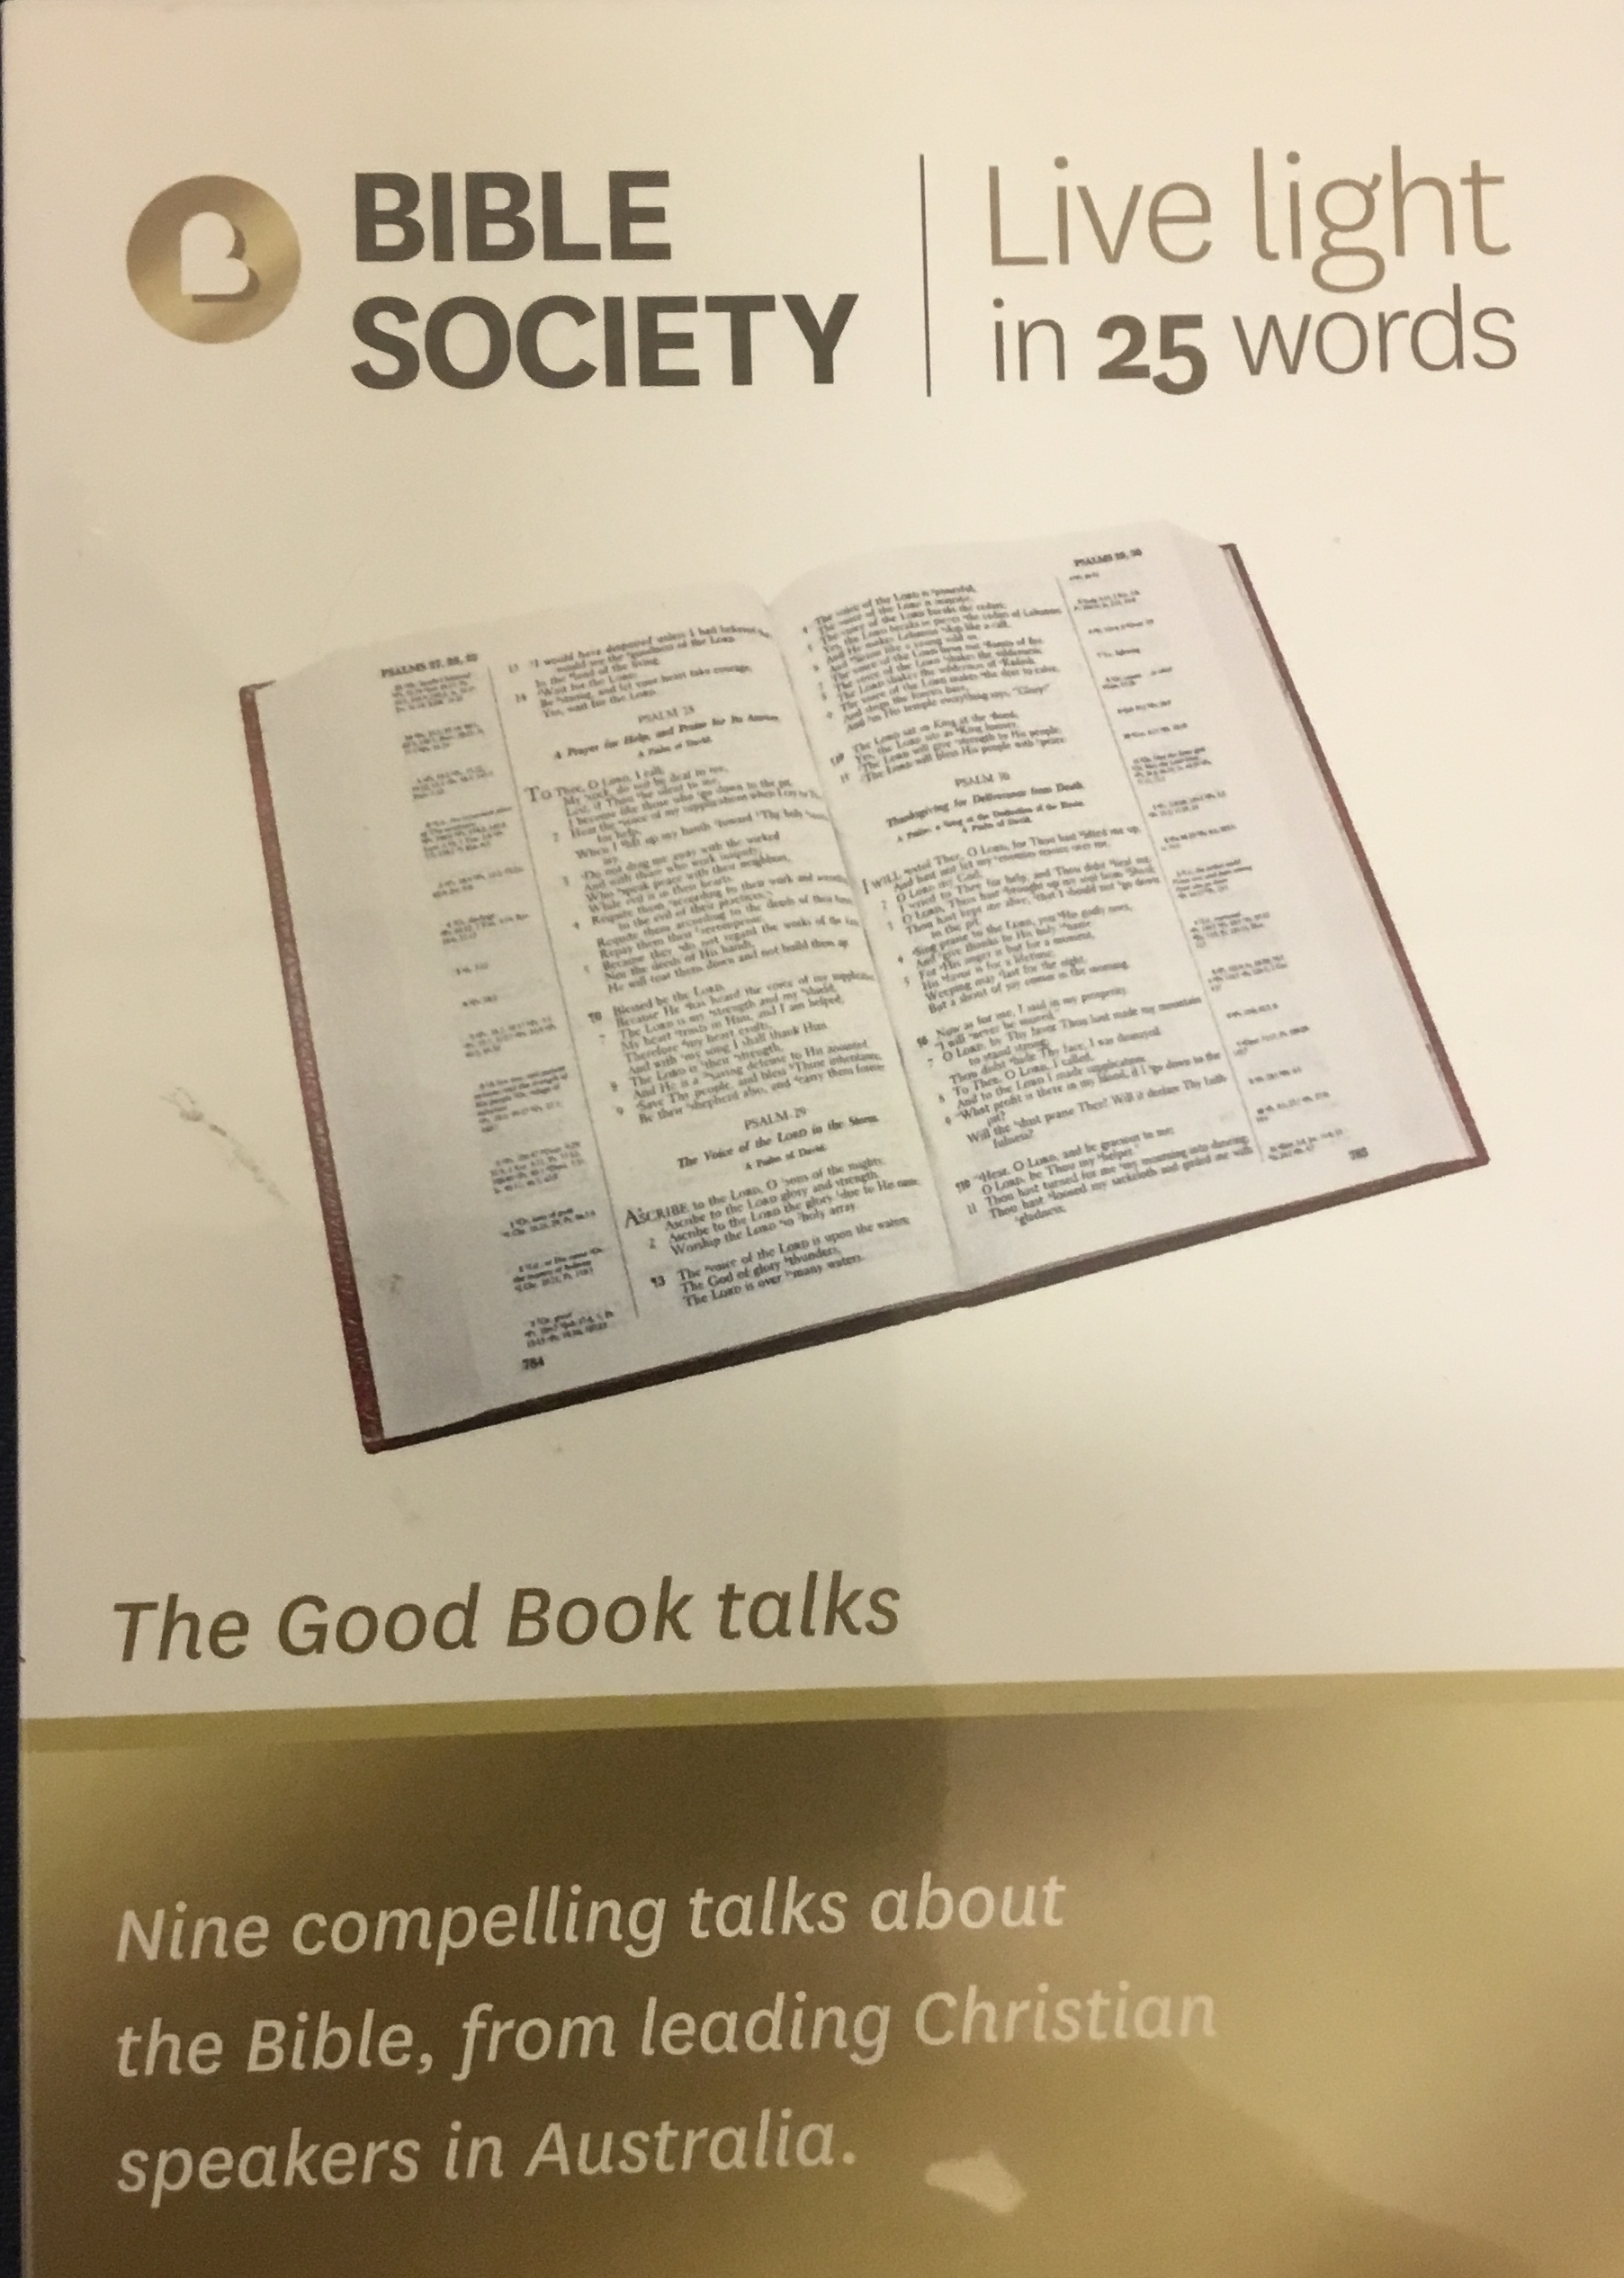 The Good Book talks